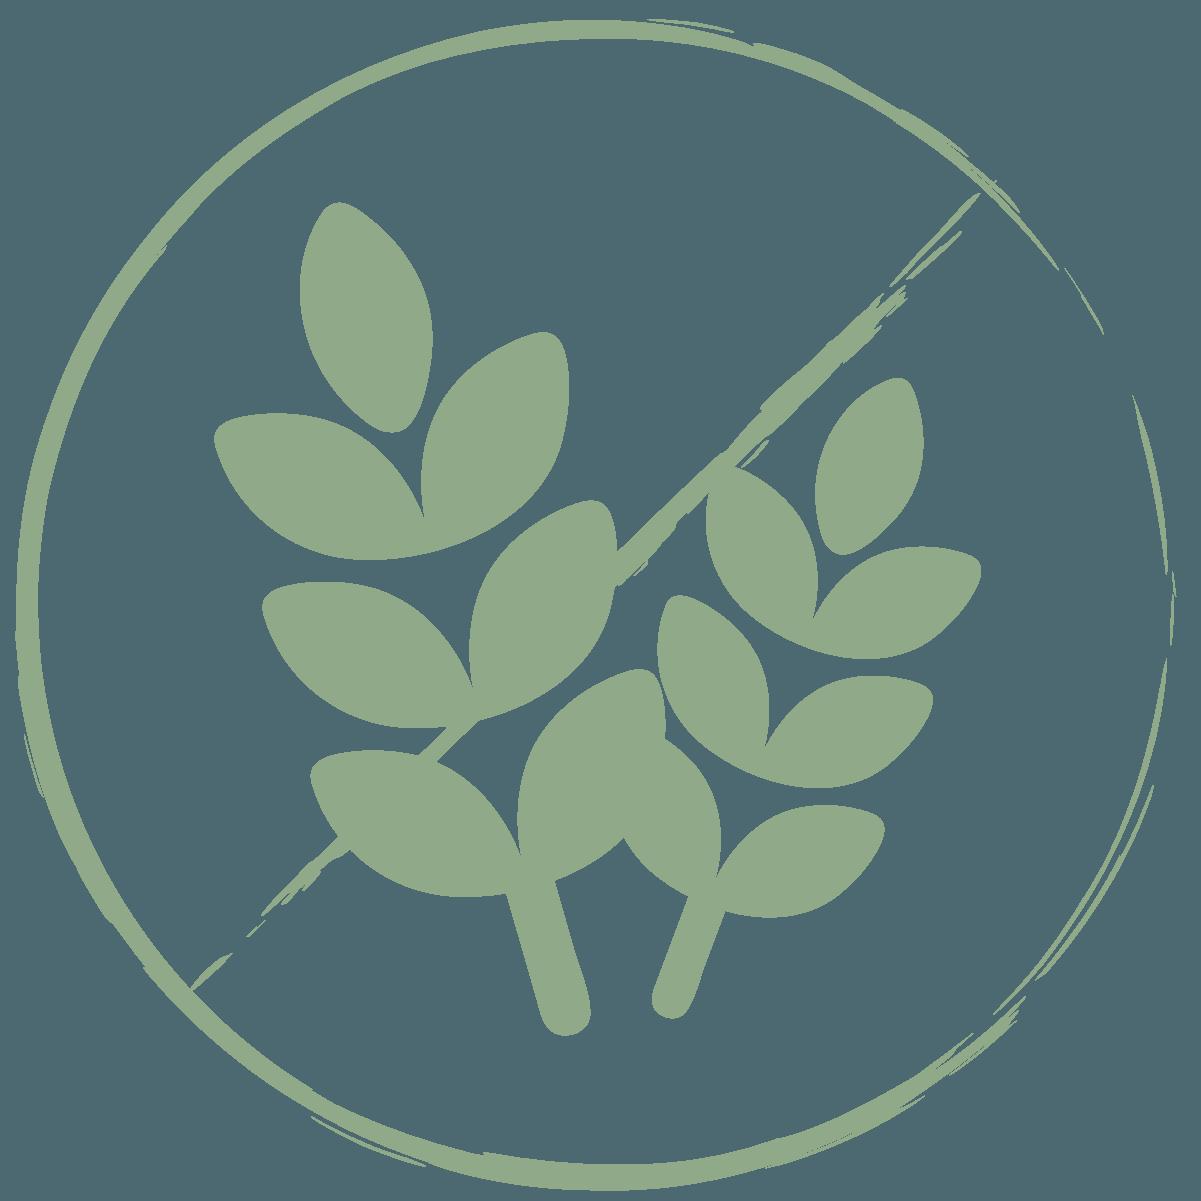 Grain free icon